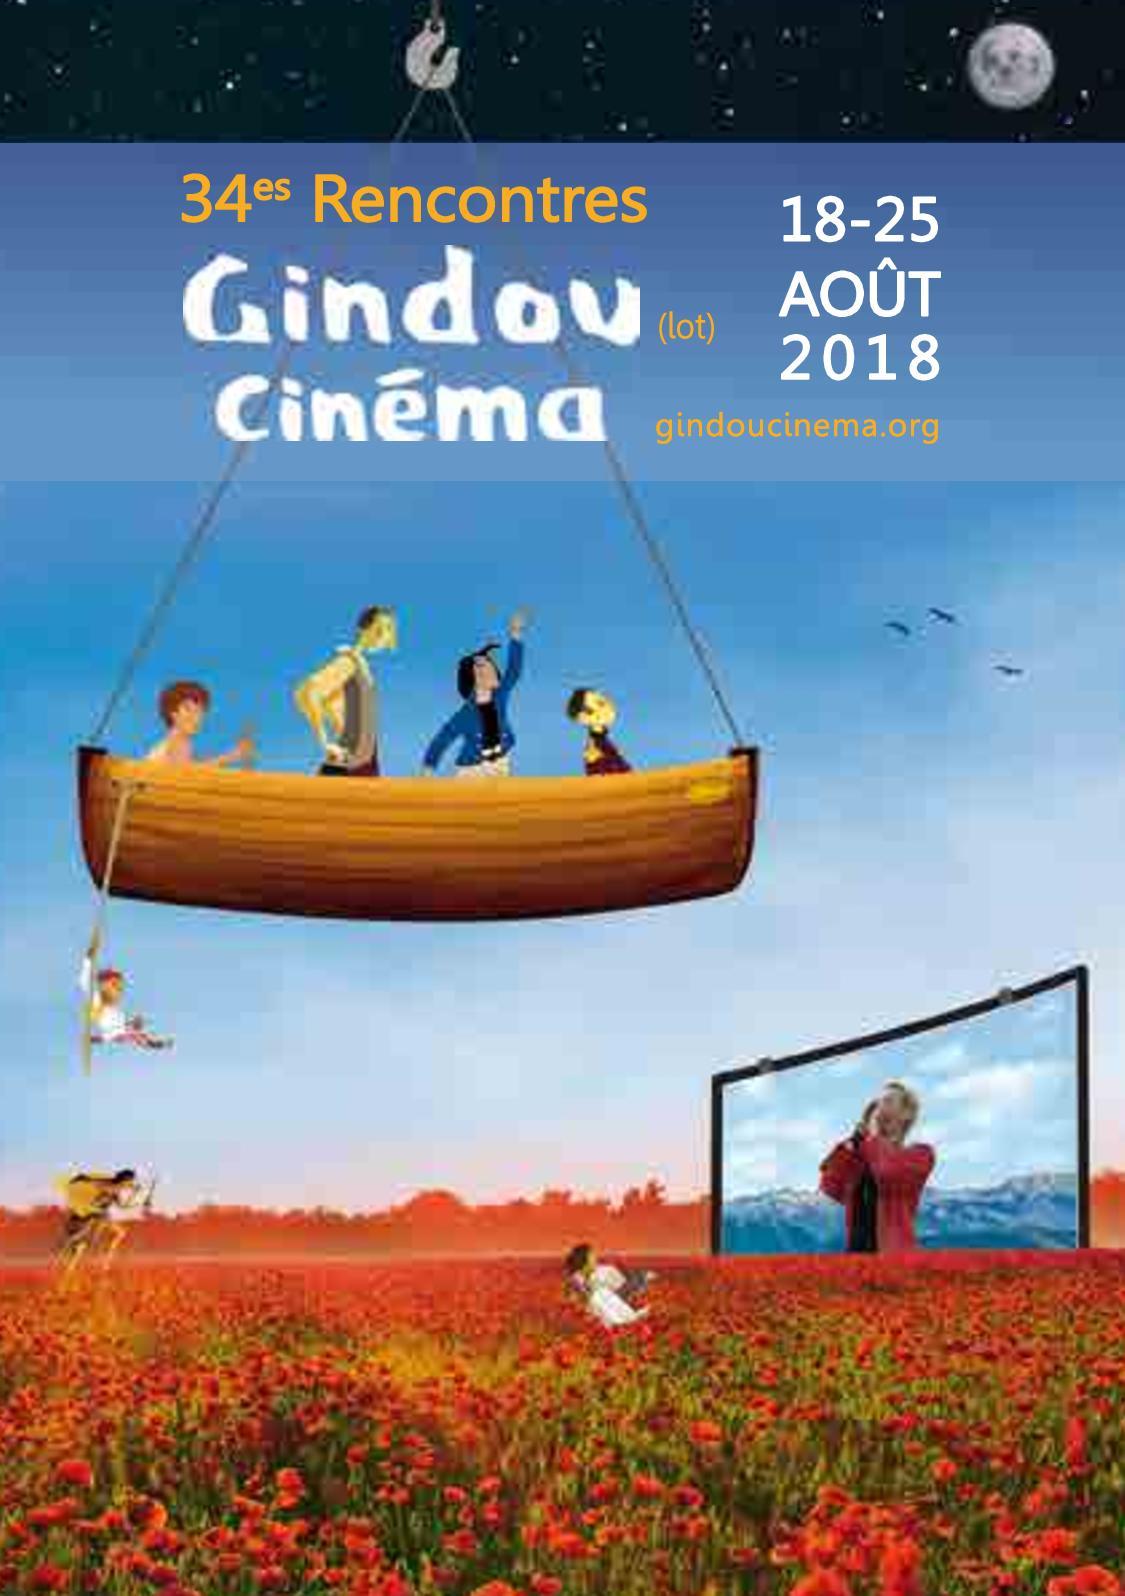 de Gindou Catalogue 34es Rencontres Cinéma Calaméo hQtsCrd